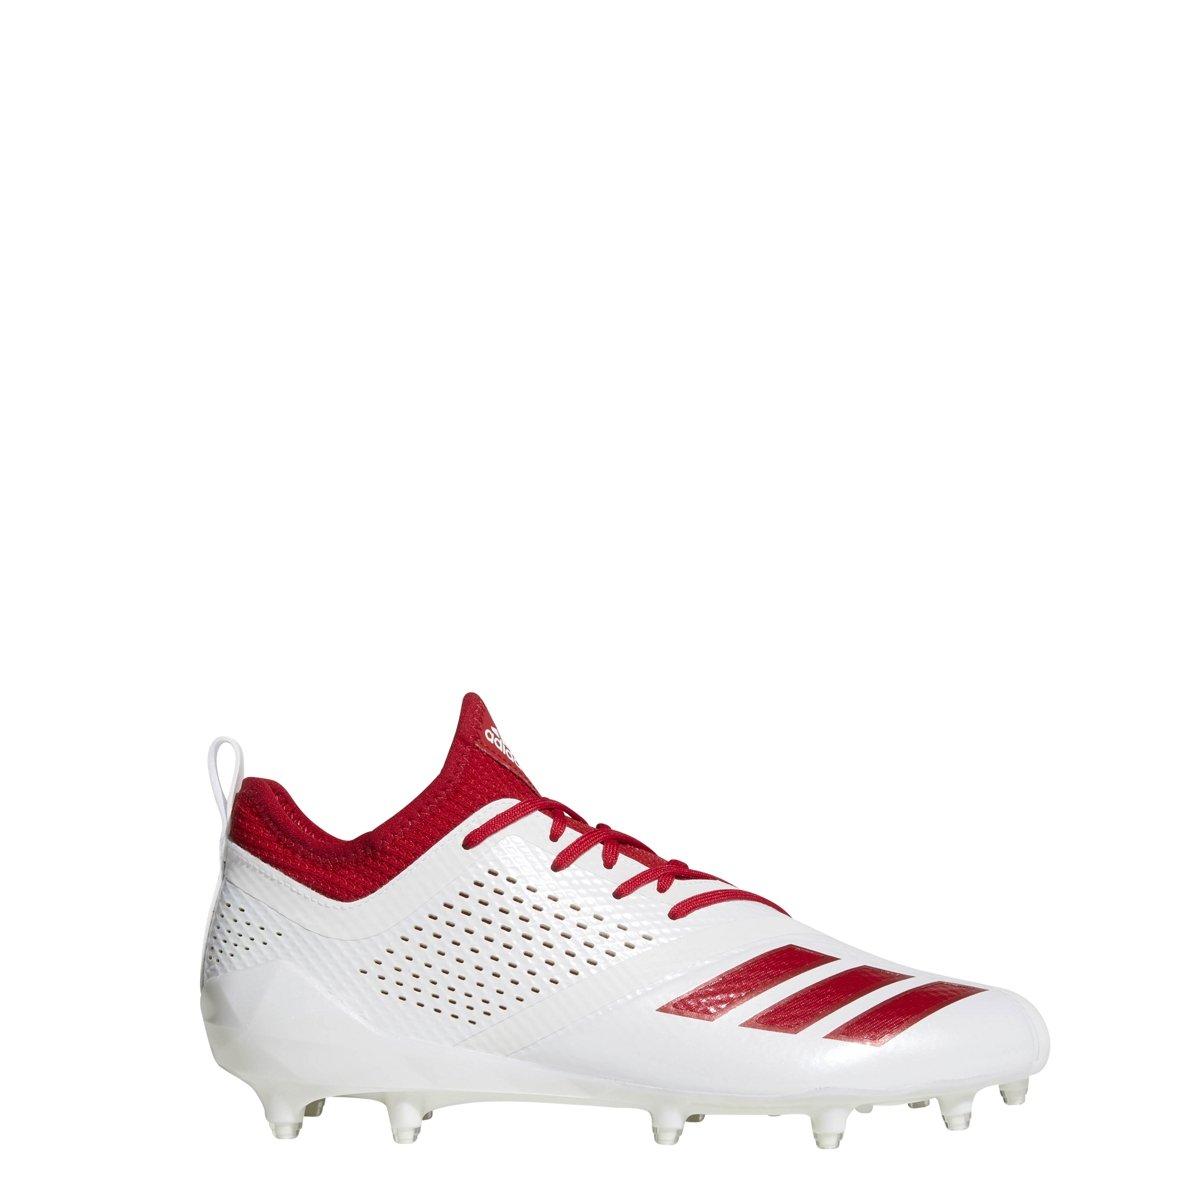 adidas uomini adizero 5 star football scarpa b07bf9qjwf 9 d (m) us